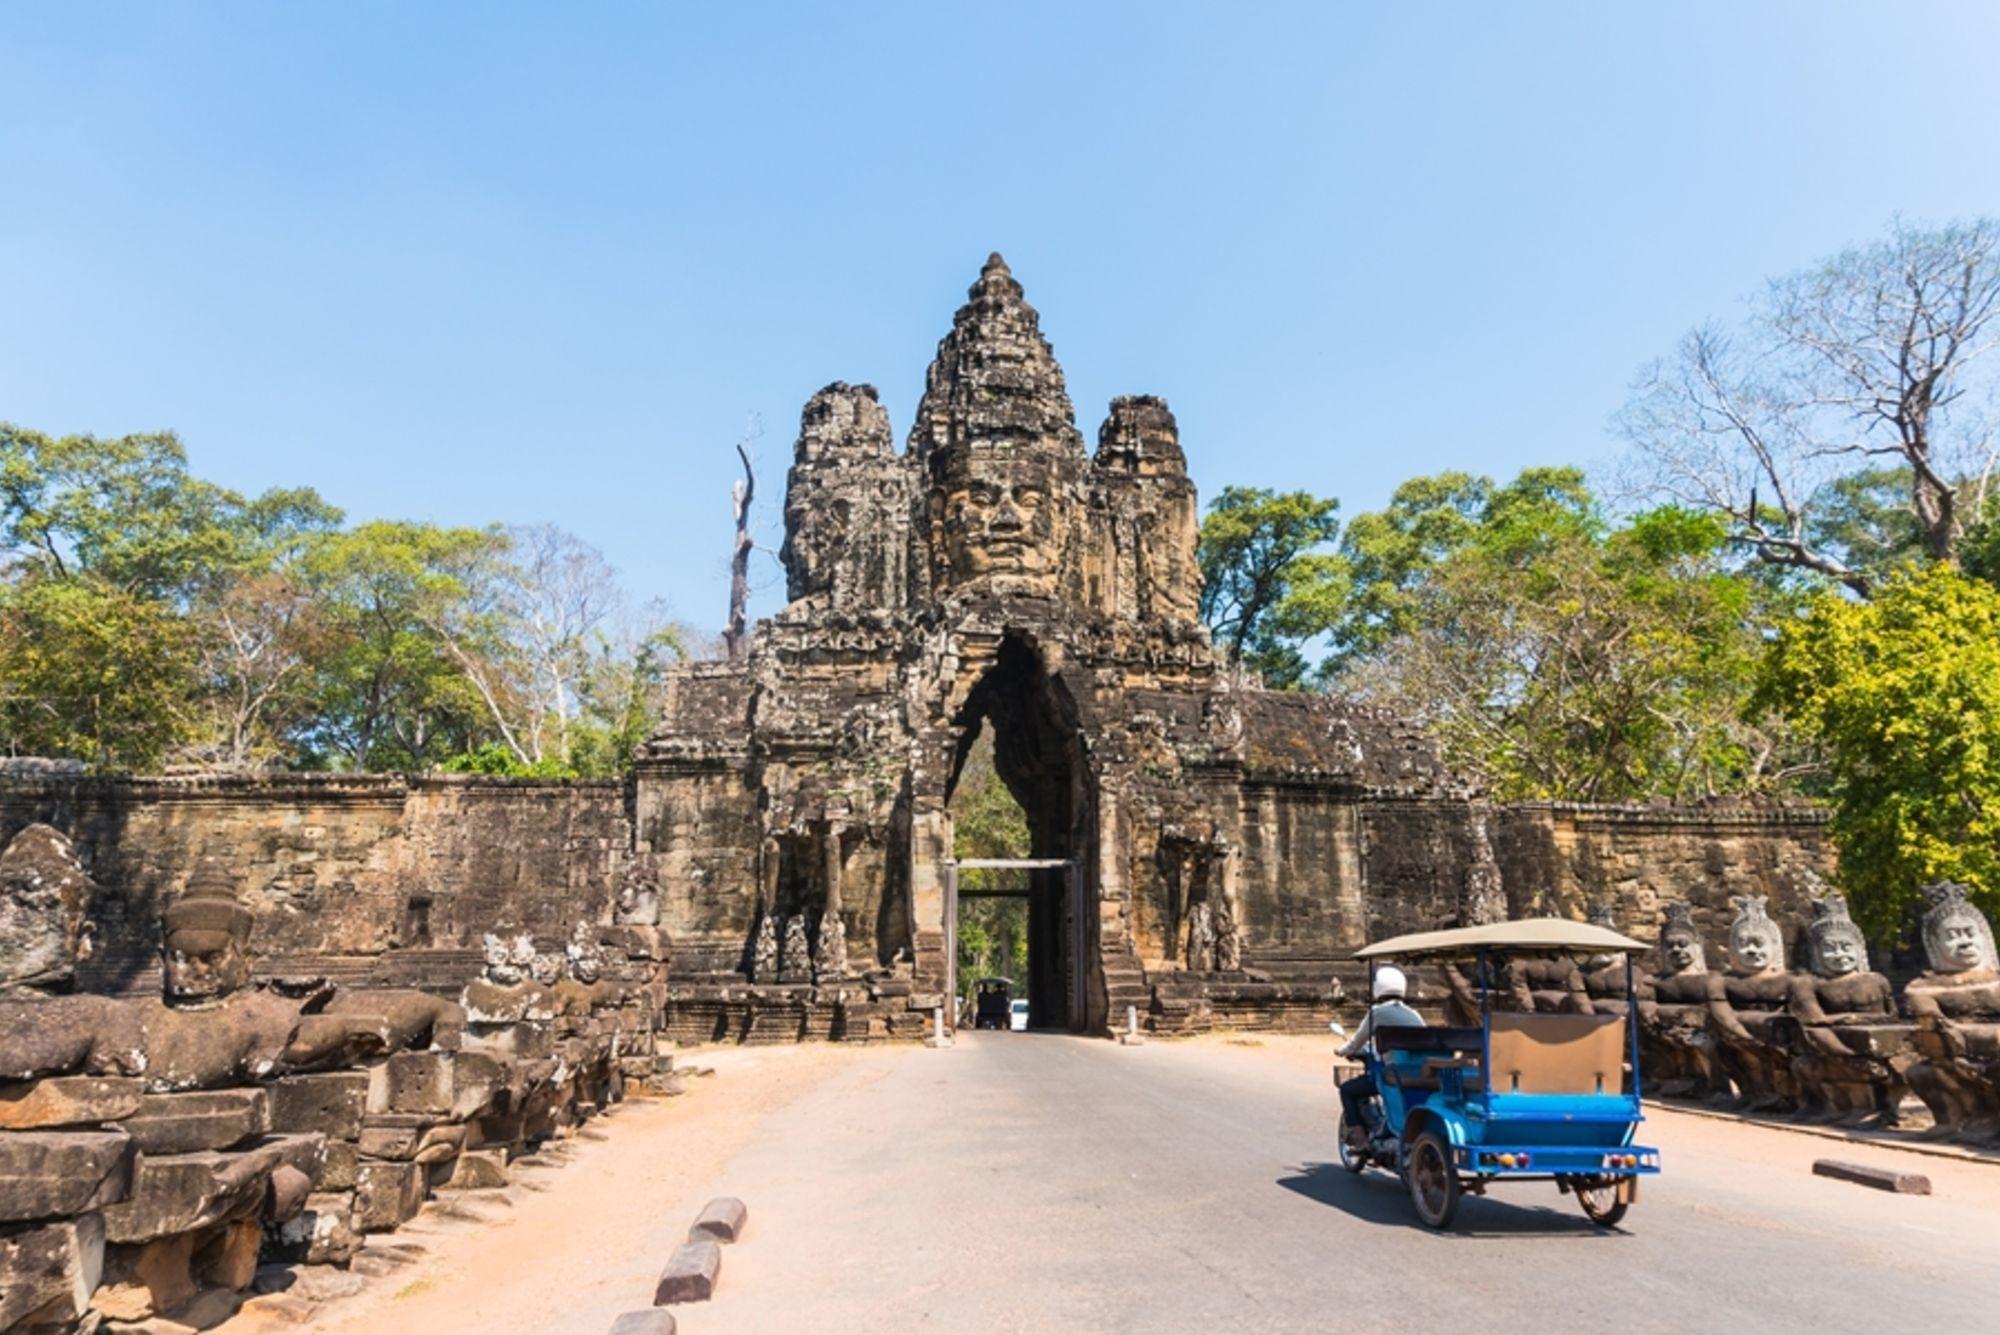 Cambodja Siem Reap Angkor Wat tuktuk 2